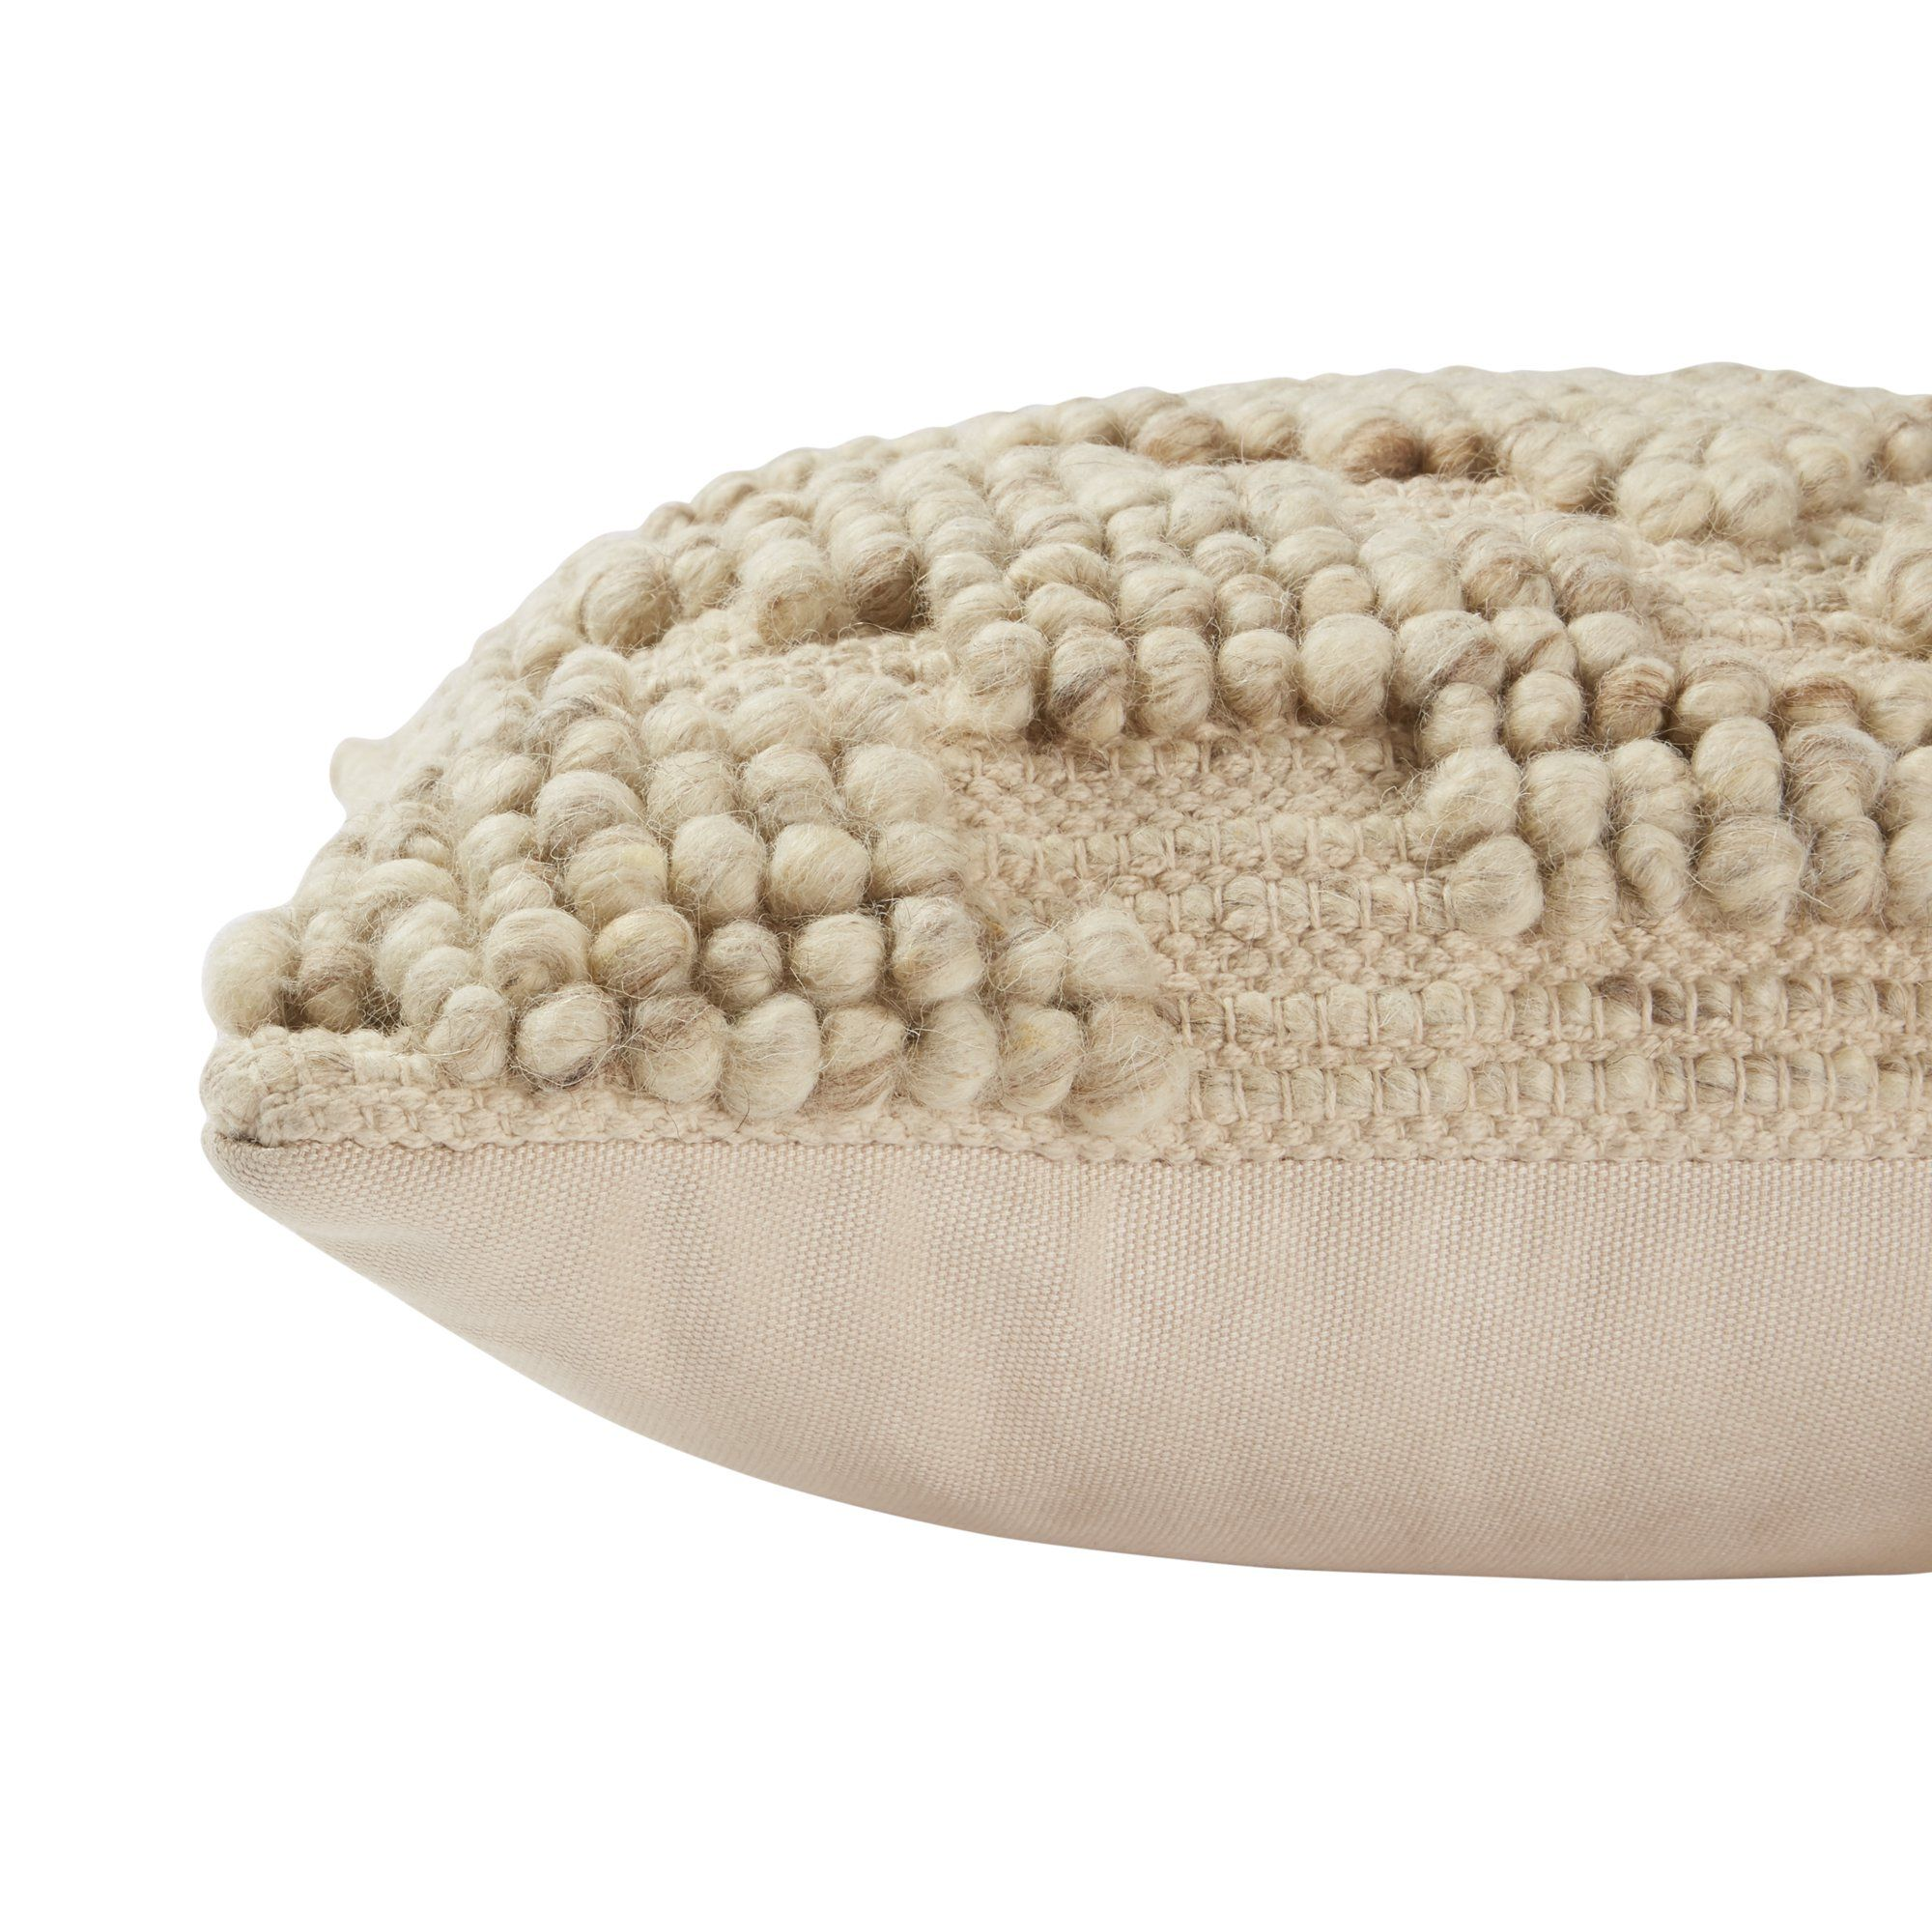 34f9e33caa09a6857c7814b72a39ff26 - Better Homes And Gardens Aztec Cream Decorative Pillow